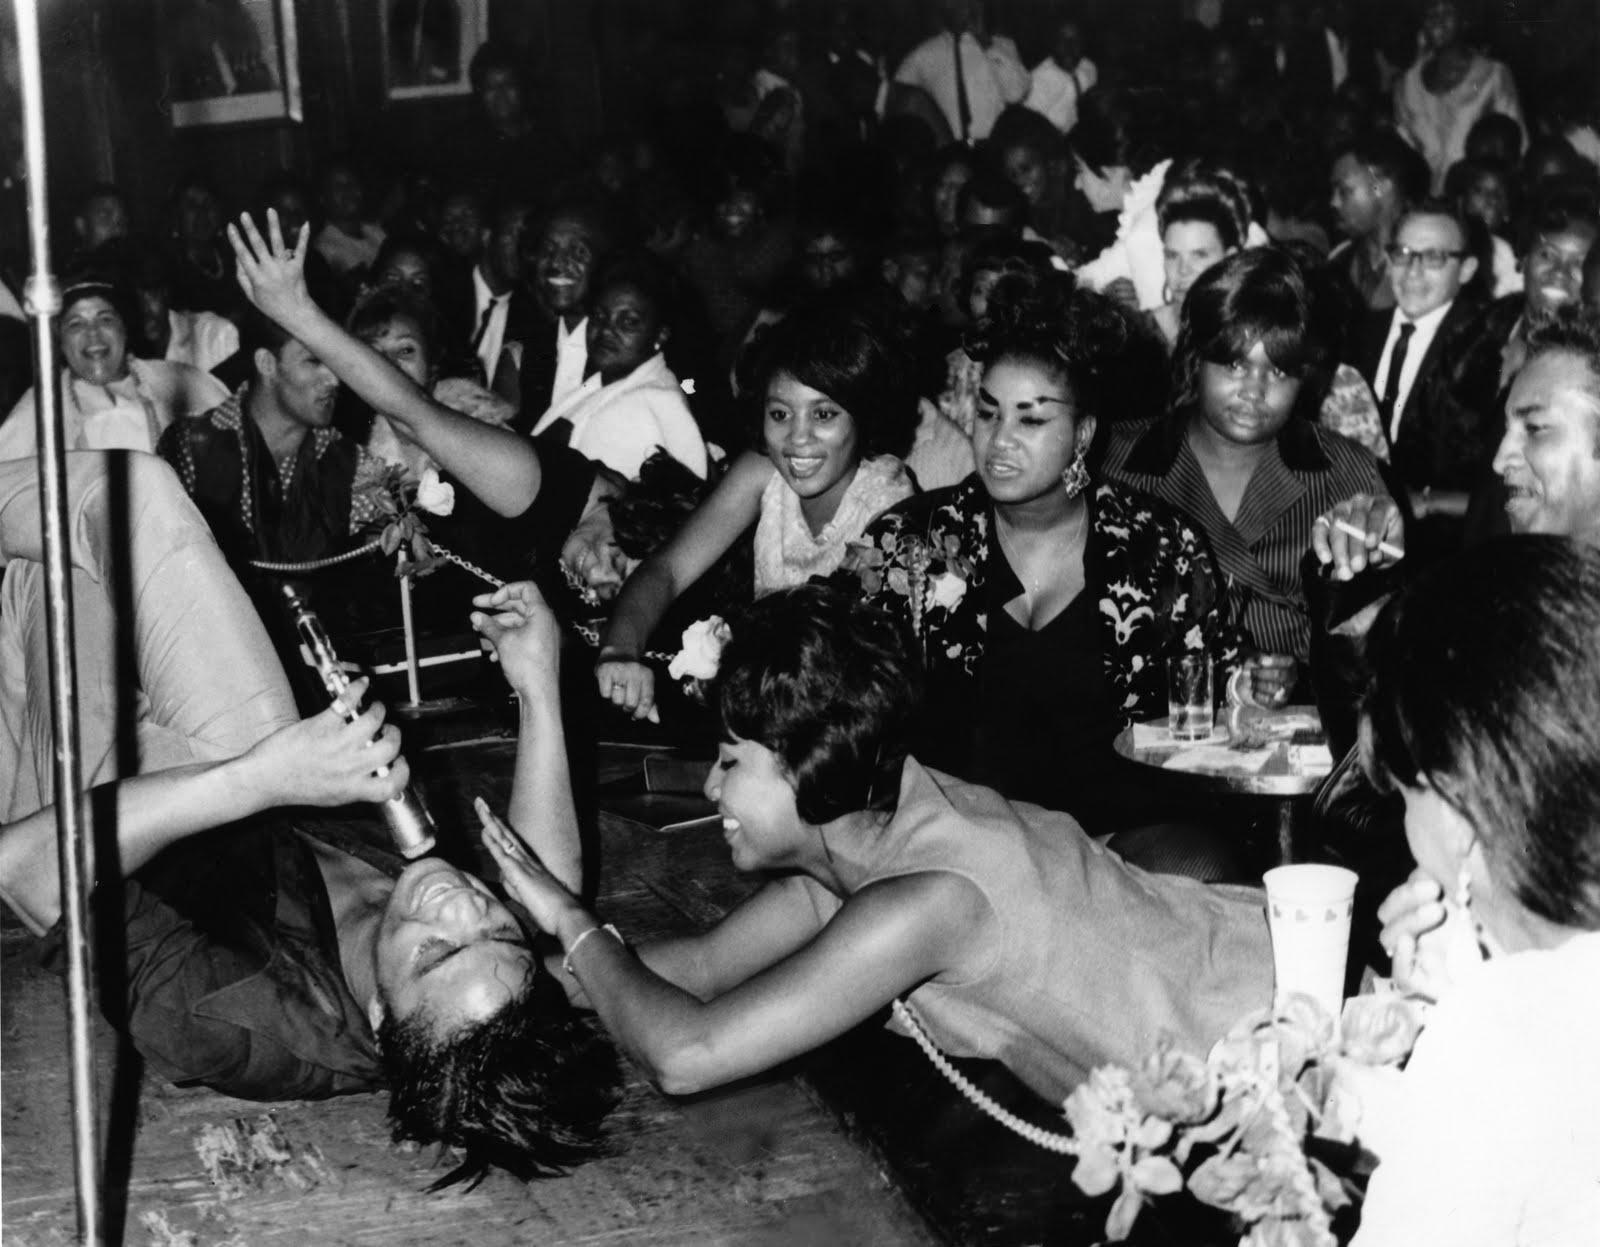 DAY 208: Dancing like Jackie Wilson | Hey man, now you're ...